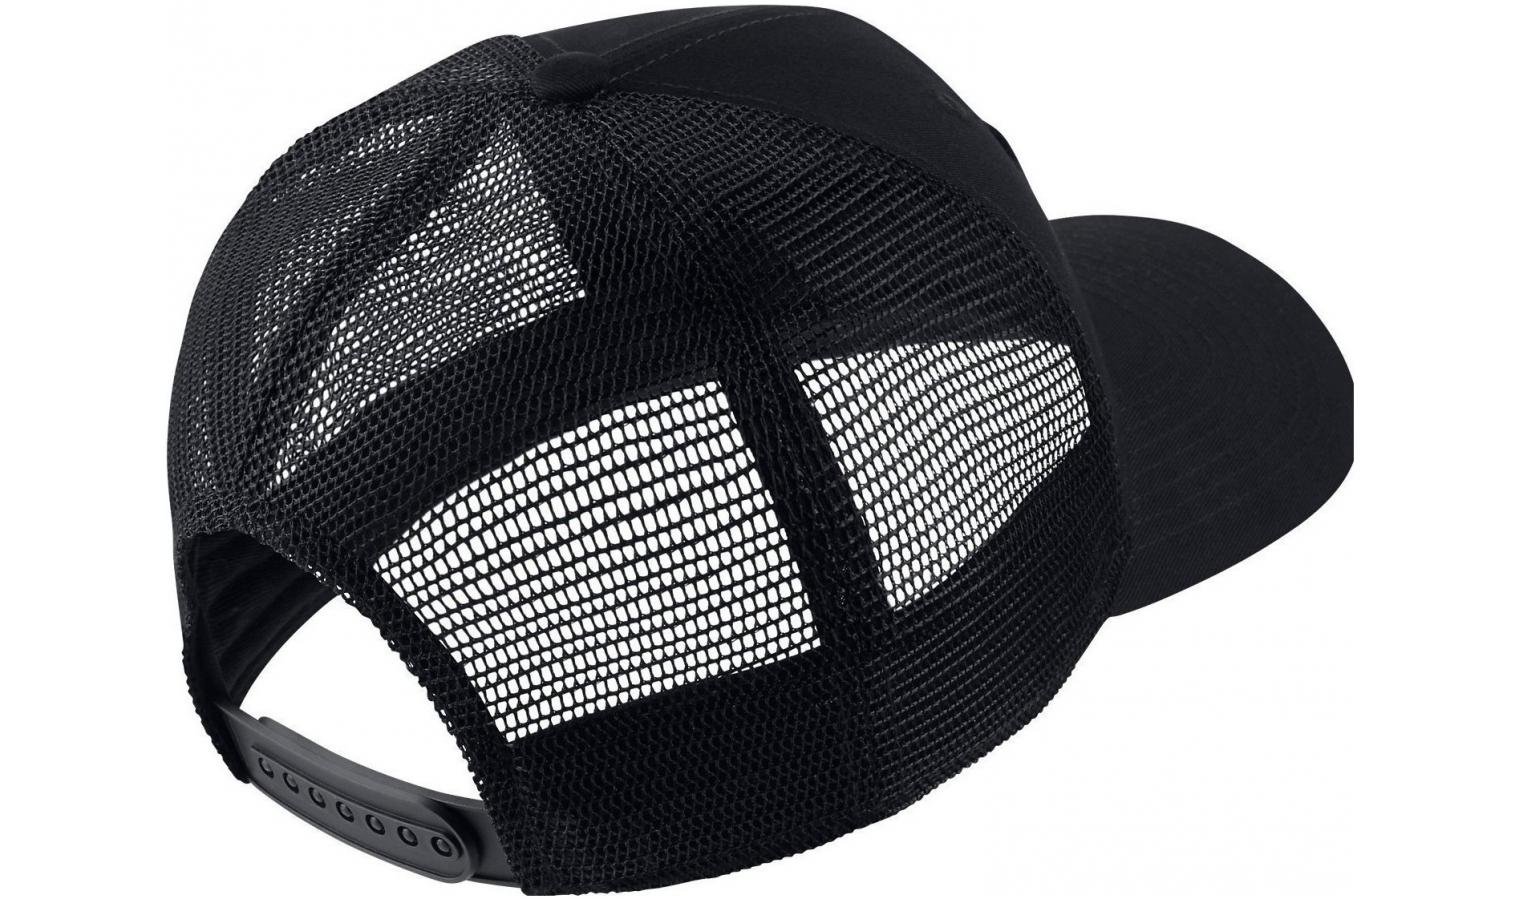 Kšiltovka Nike U NSW CLC99 CAP TRUCKER černá  c333a40771